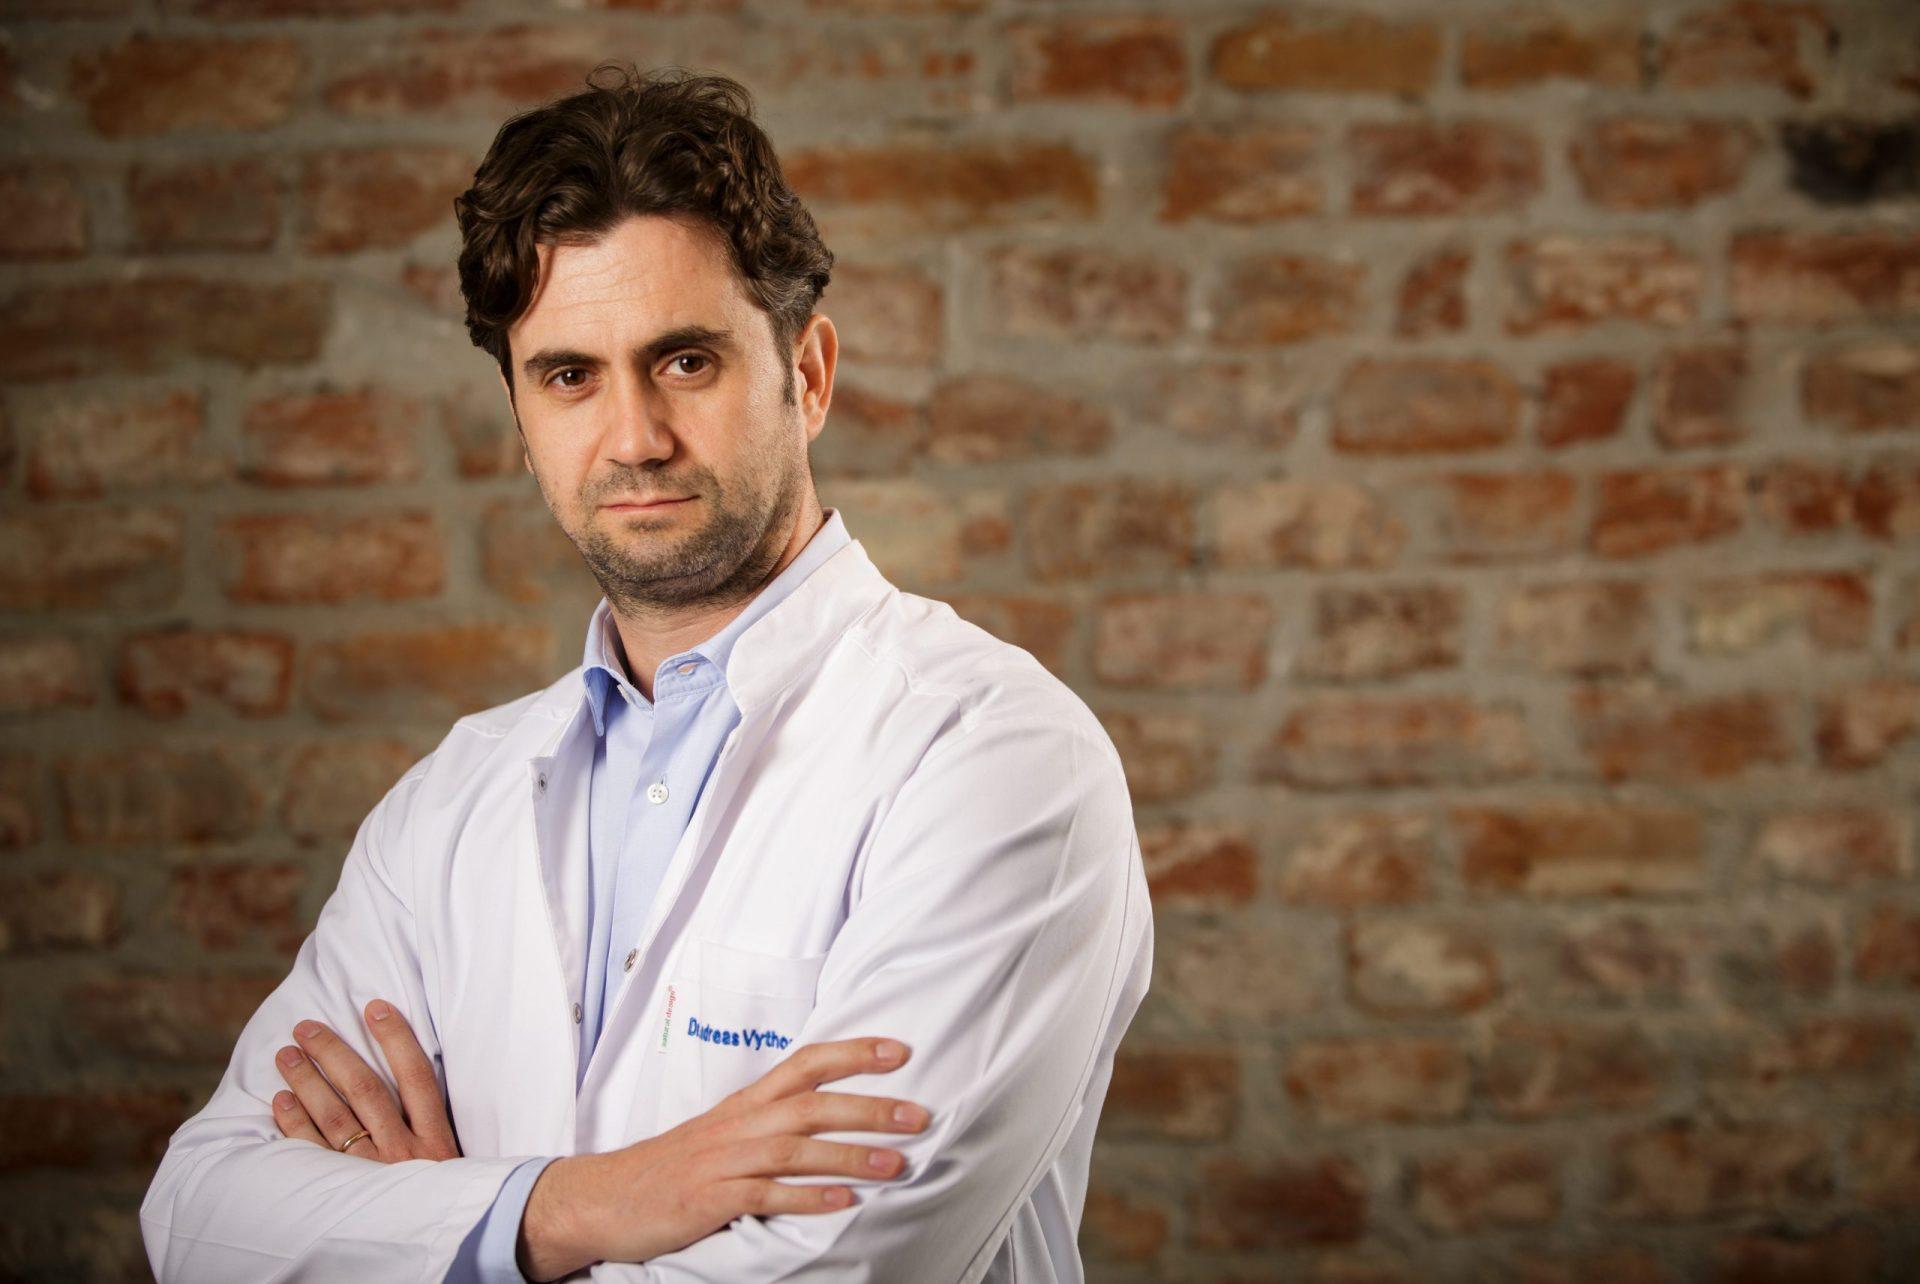 dr. Andreas Vythoulkas